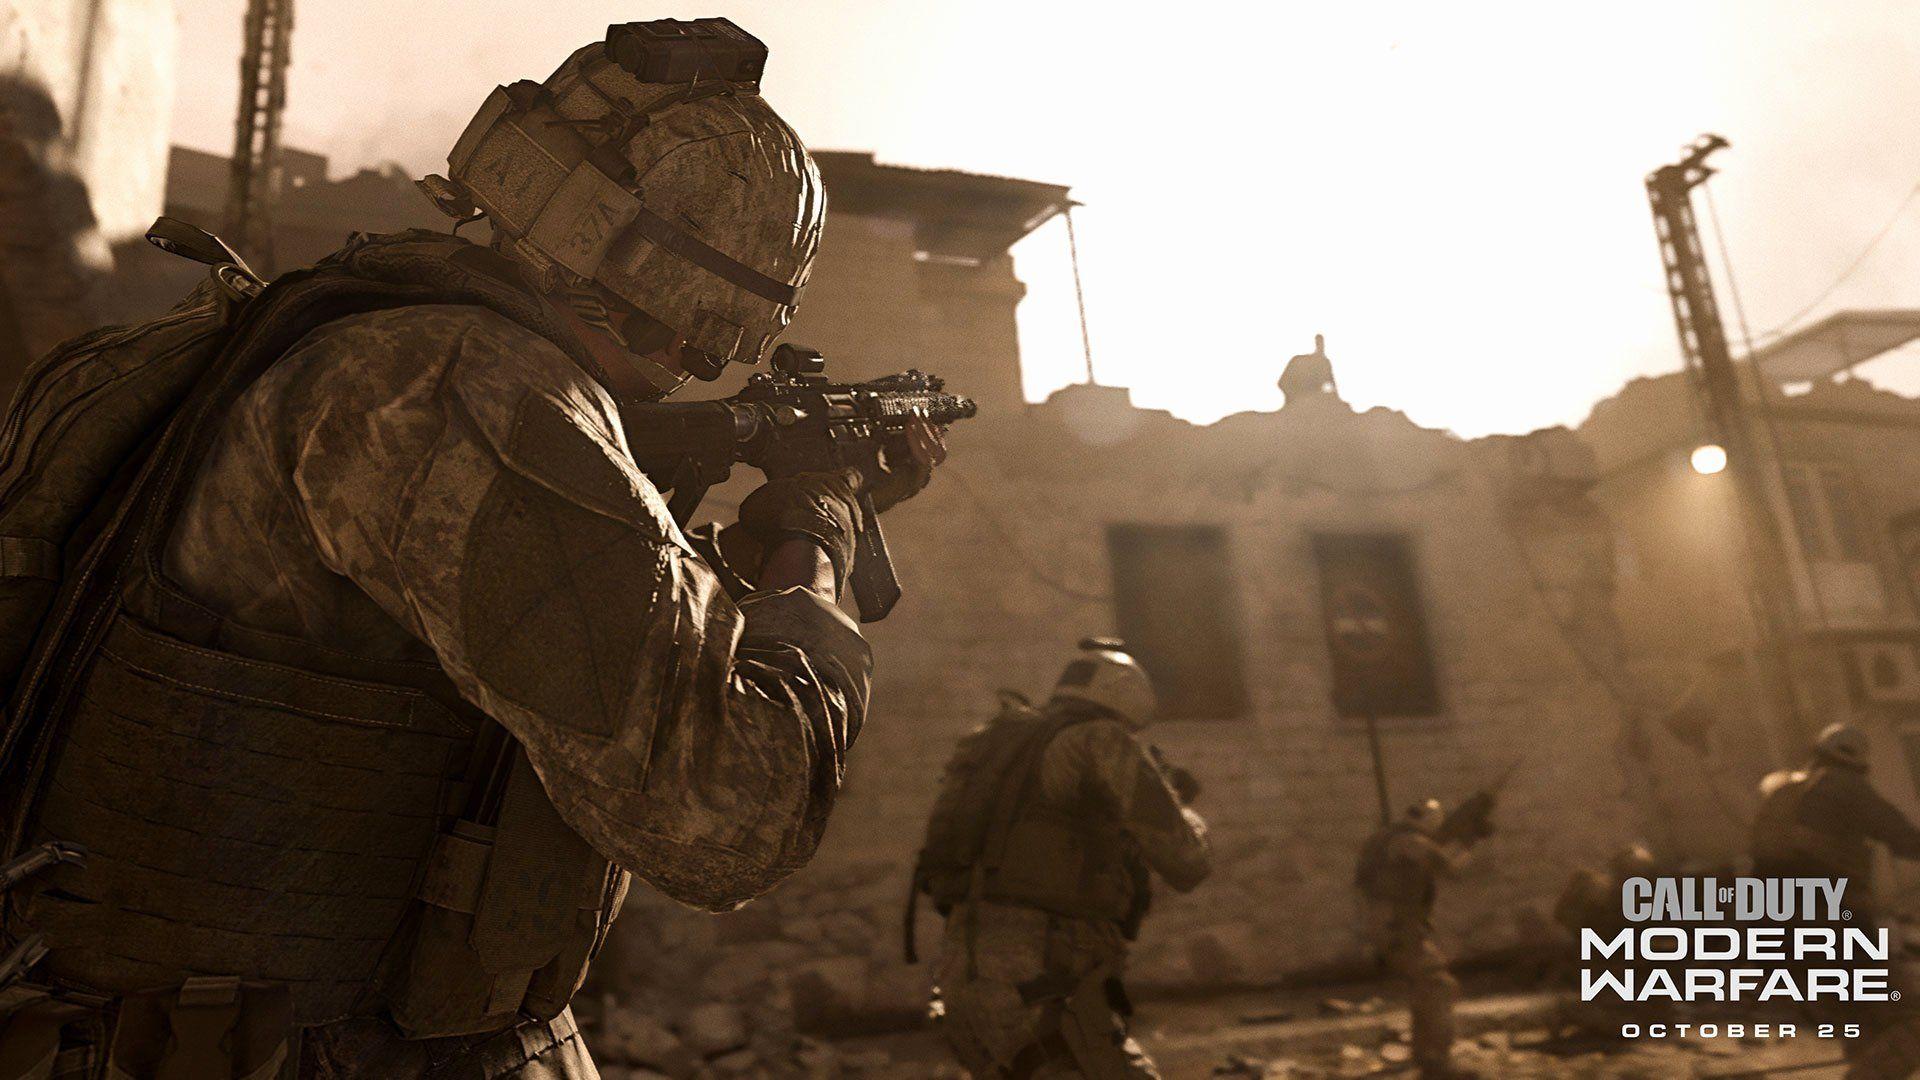 Animal Coloring Book Mod Apk Fresh Call Of Duty Modern Warfare 2019 Release Date Trailers In 2020 Modern Warfare Call Of Duty Advanced Warfare